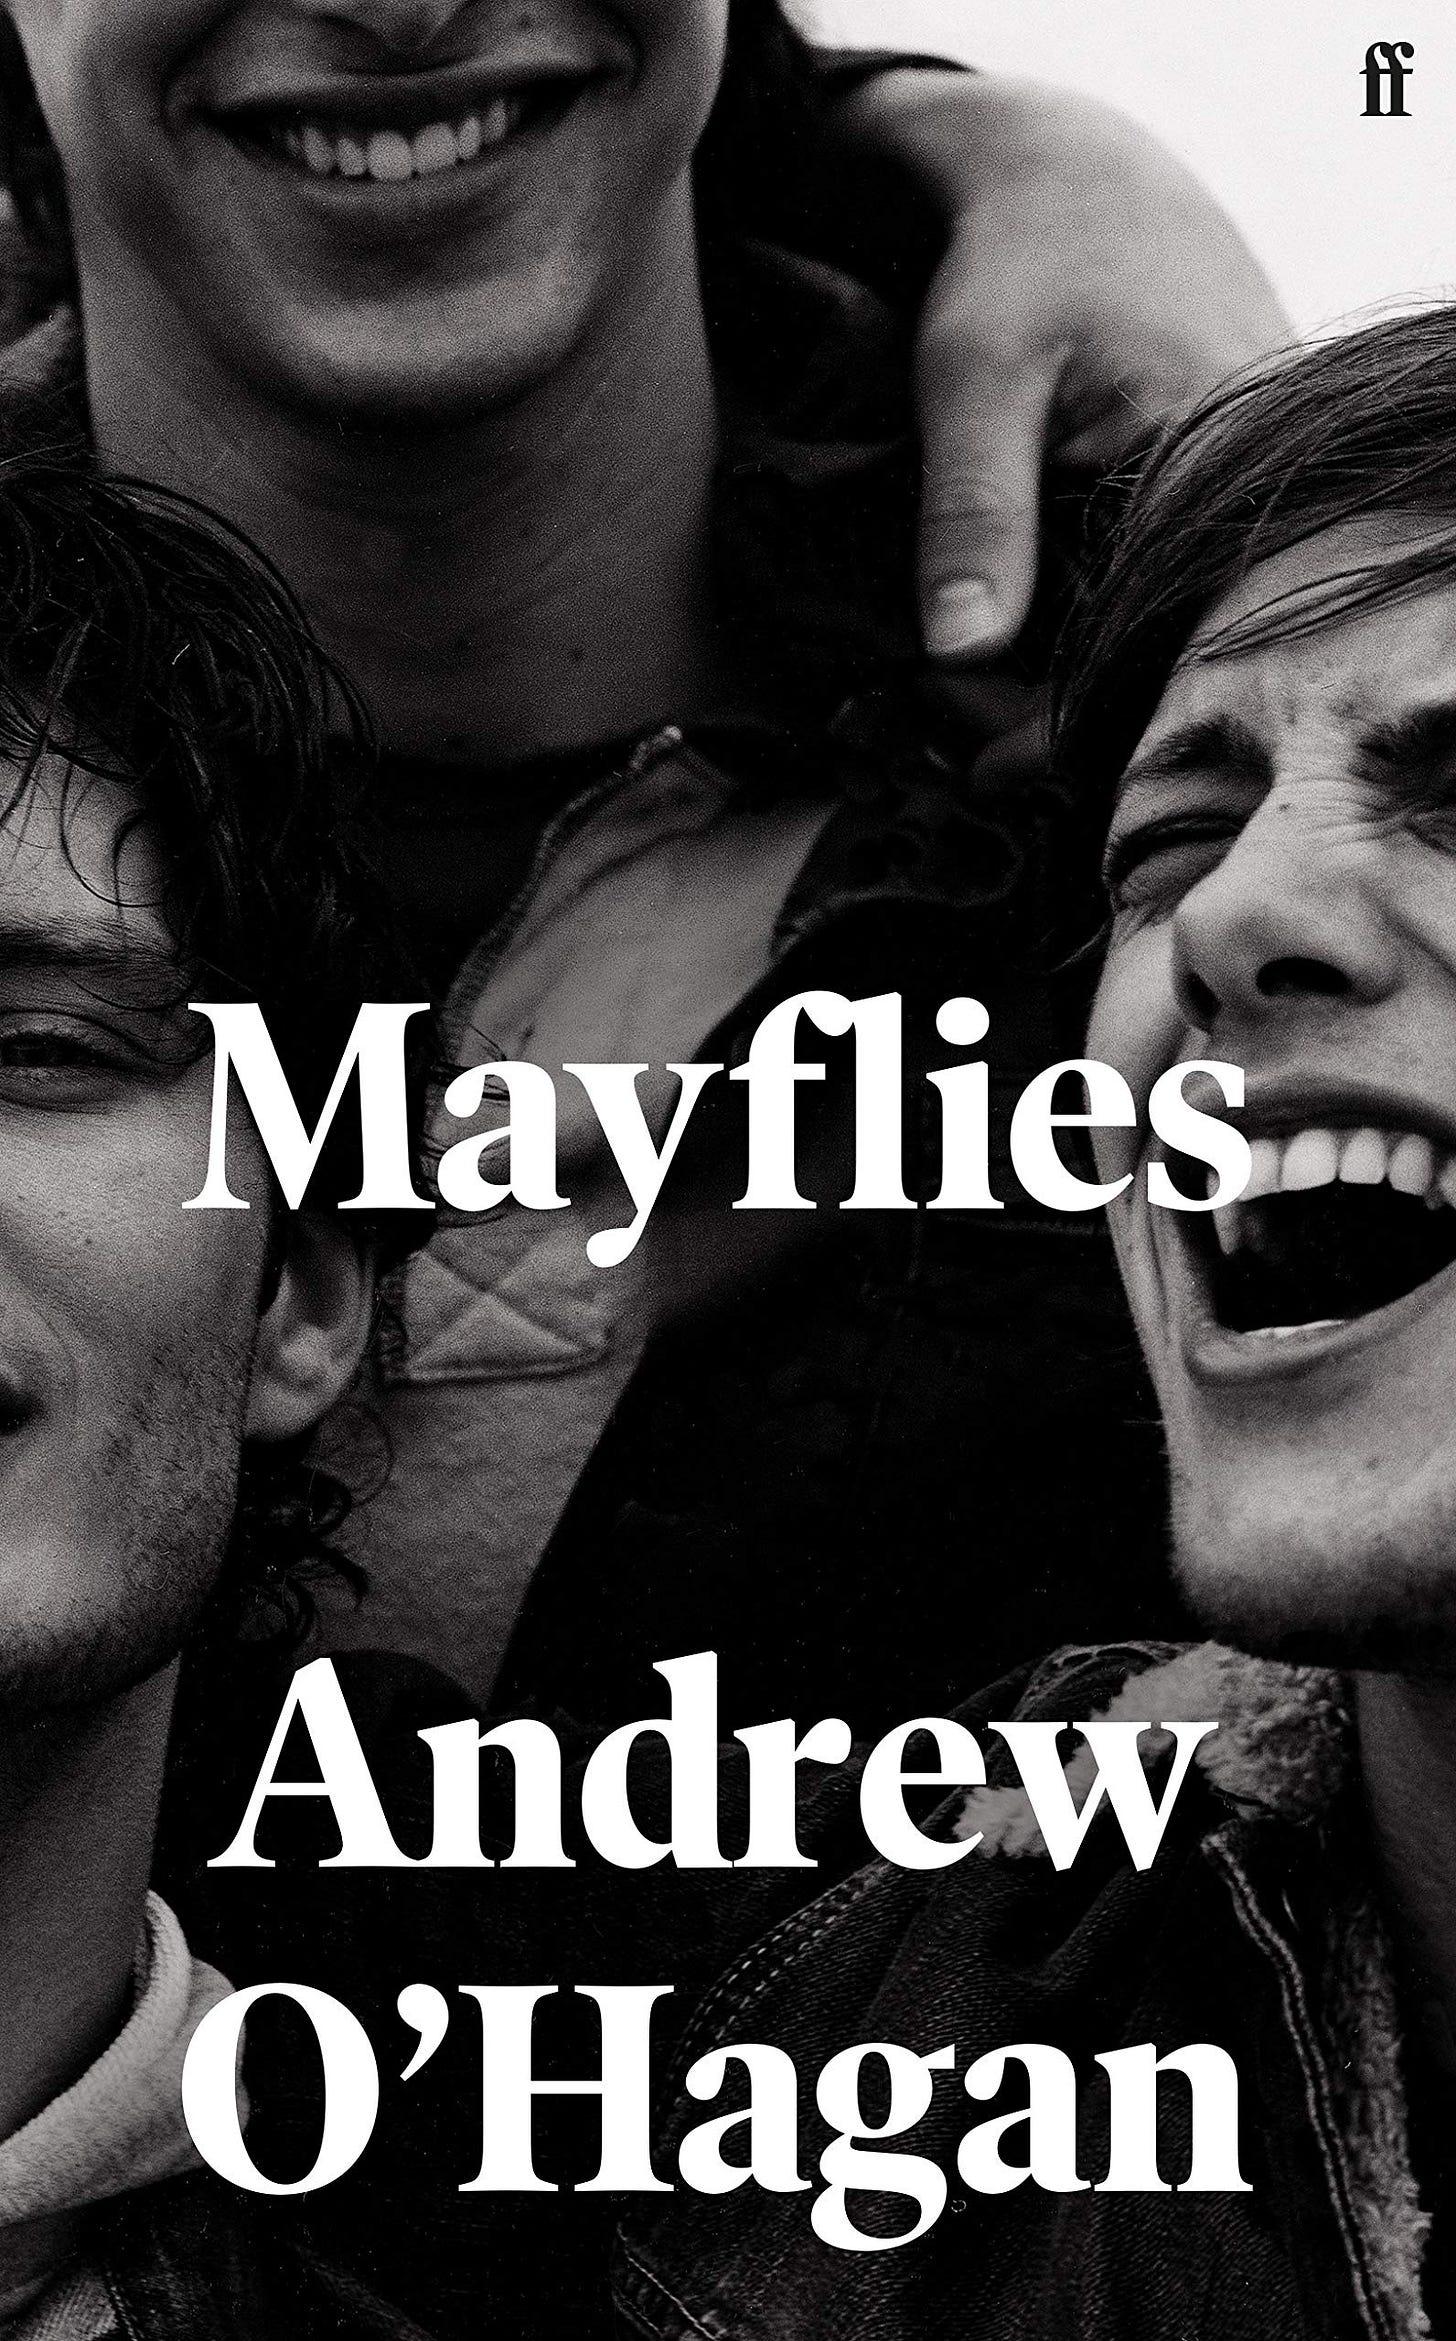 Mayflies: Amazon.co.uk: O'Hagan, Andrew: 9780571273683: Books